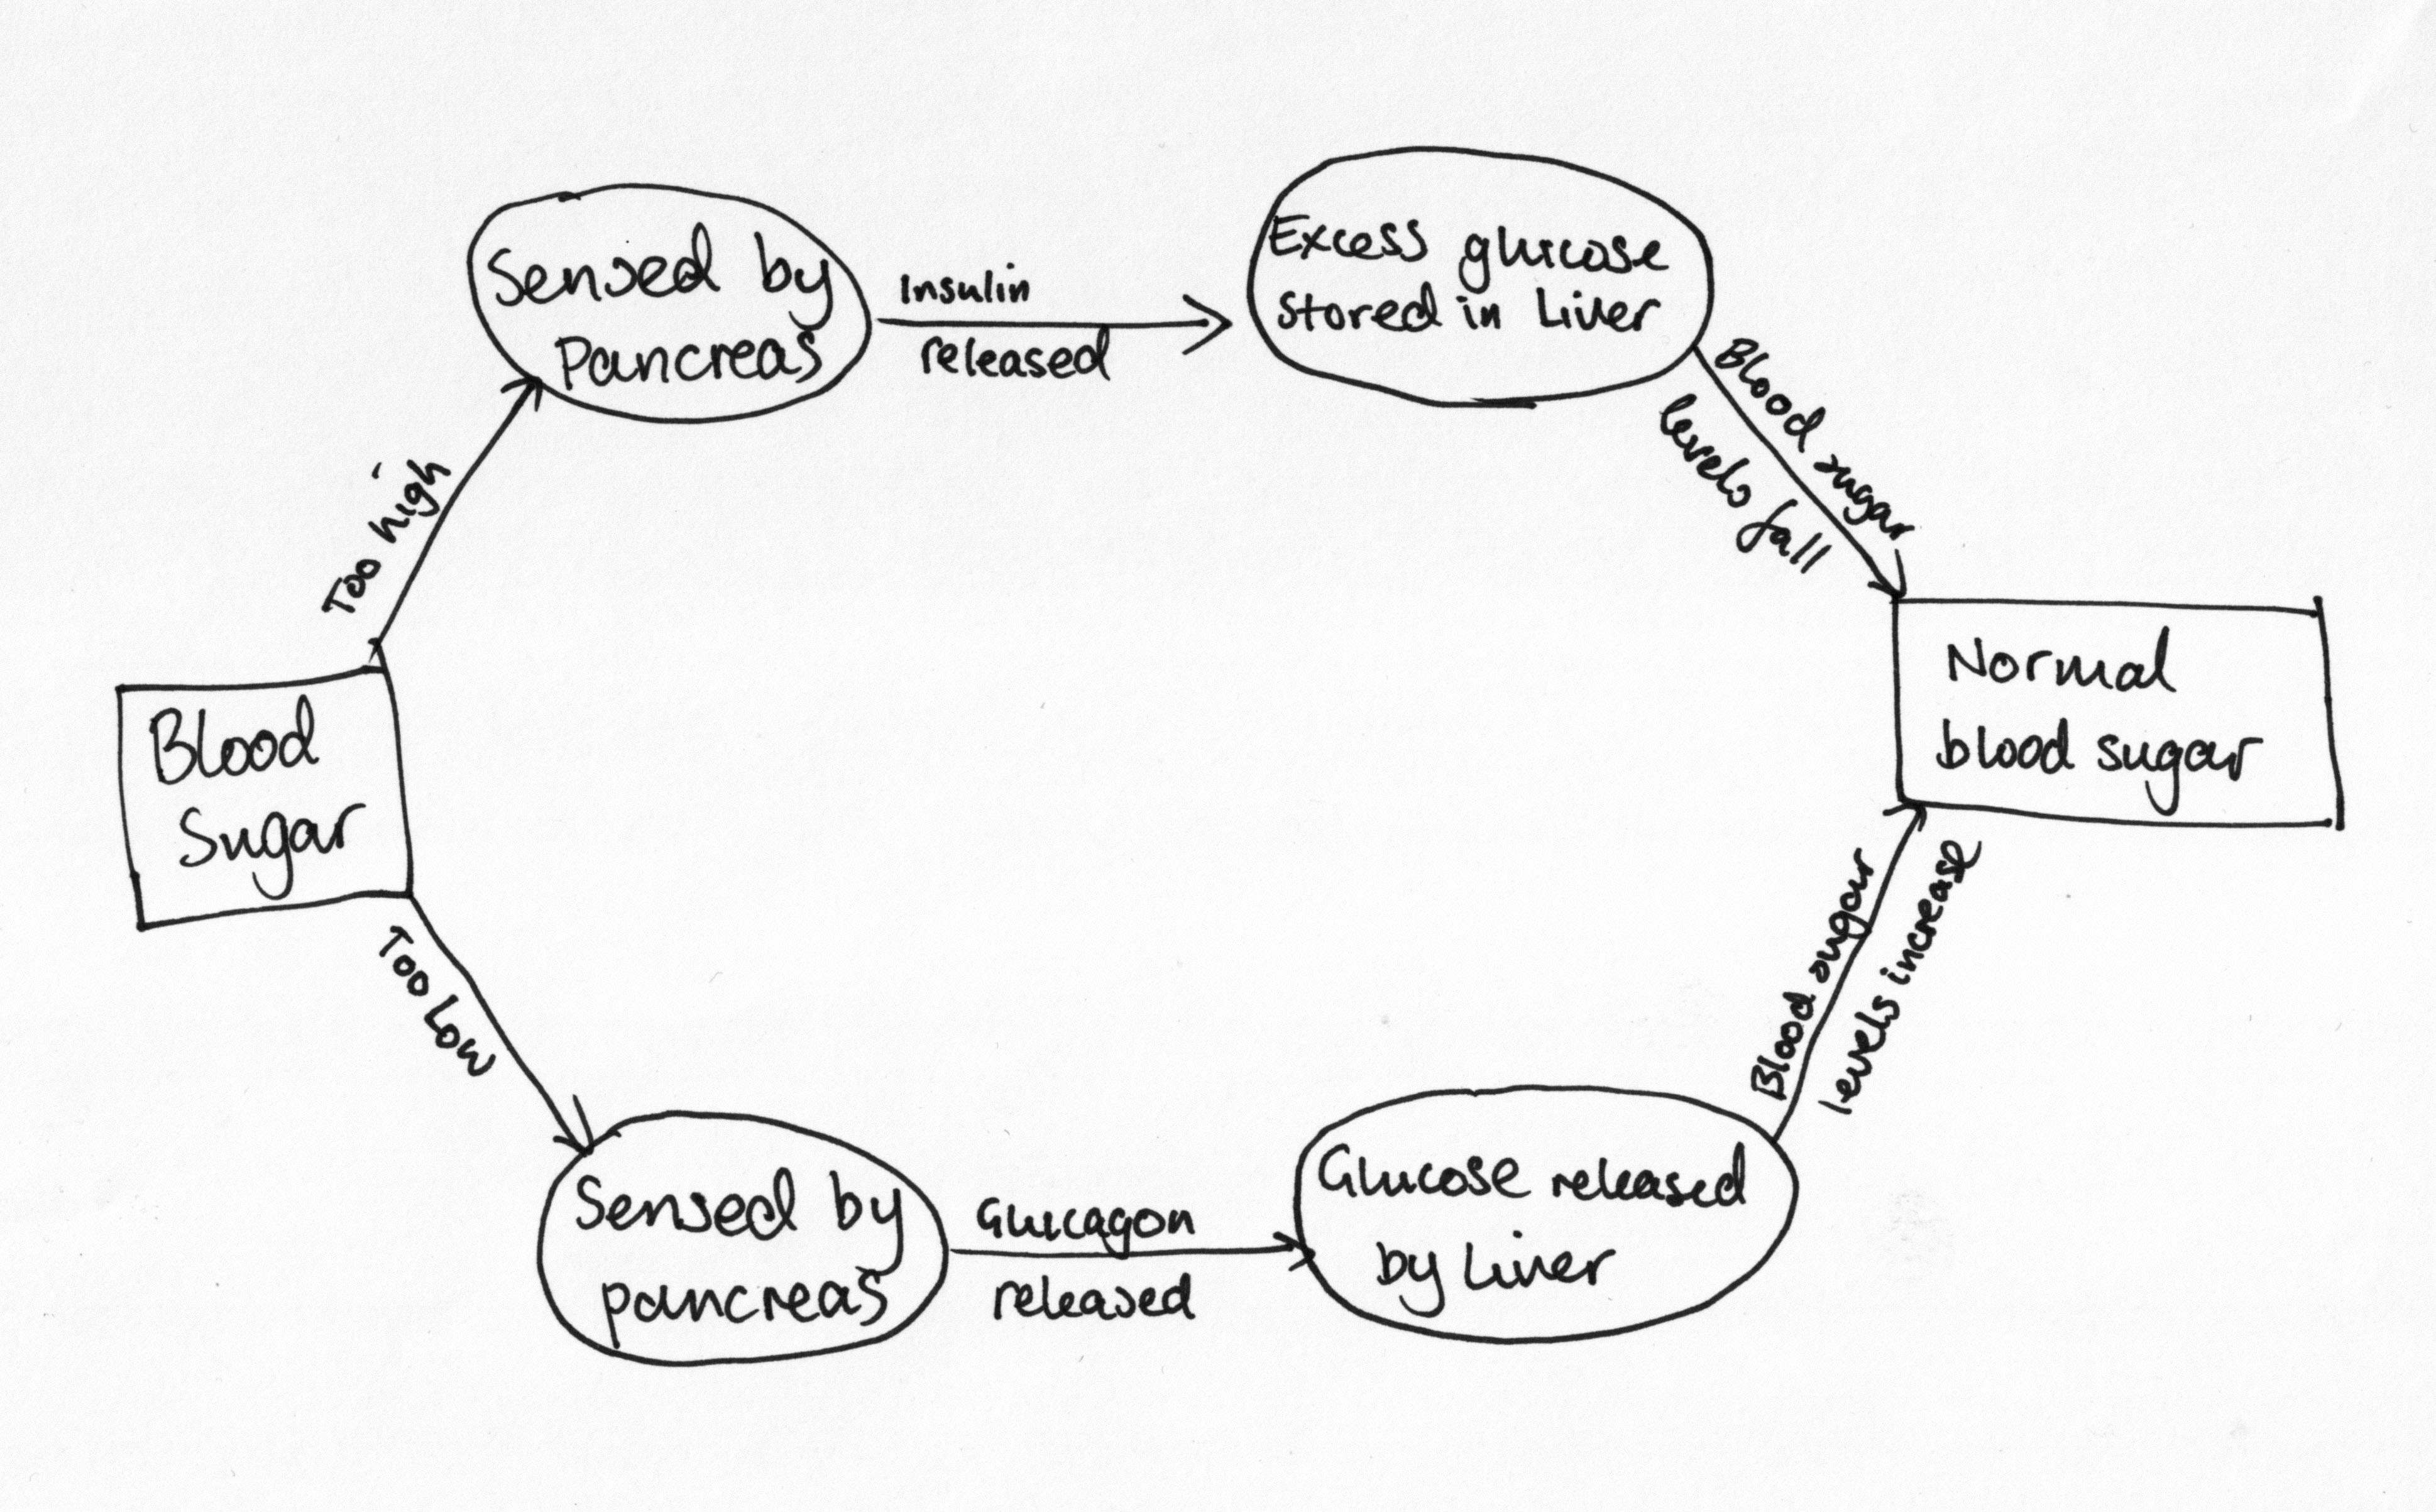 diagram of blood sugar